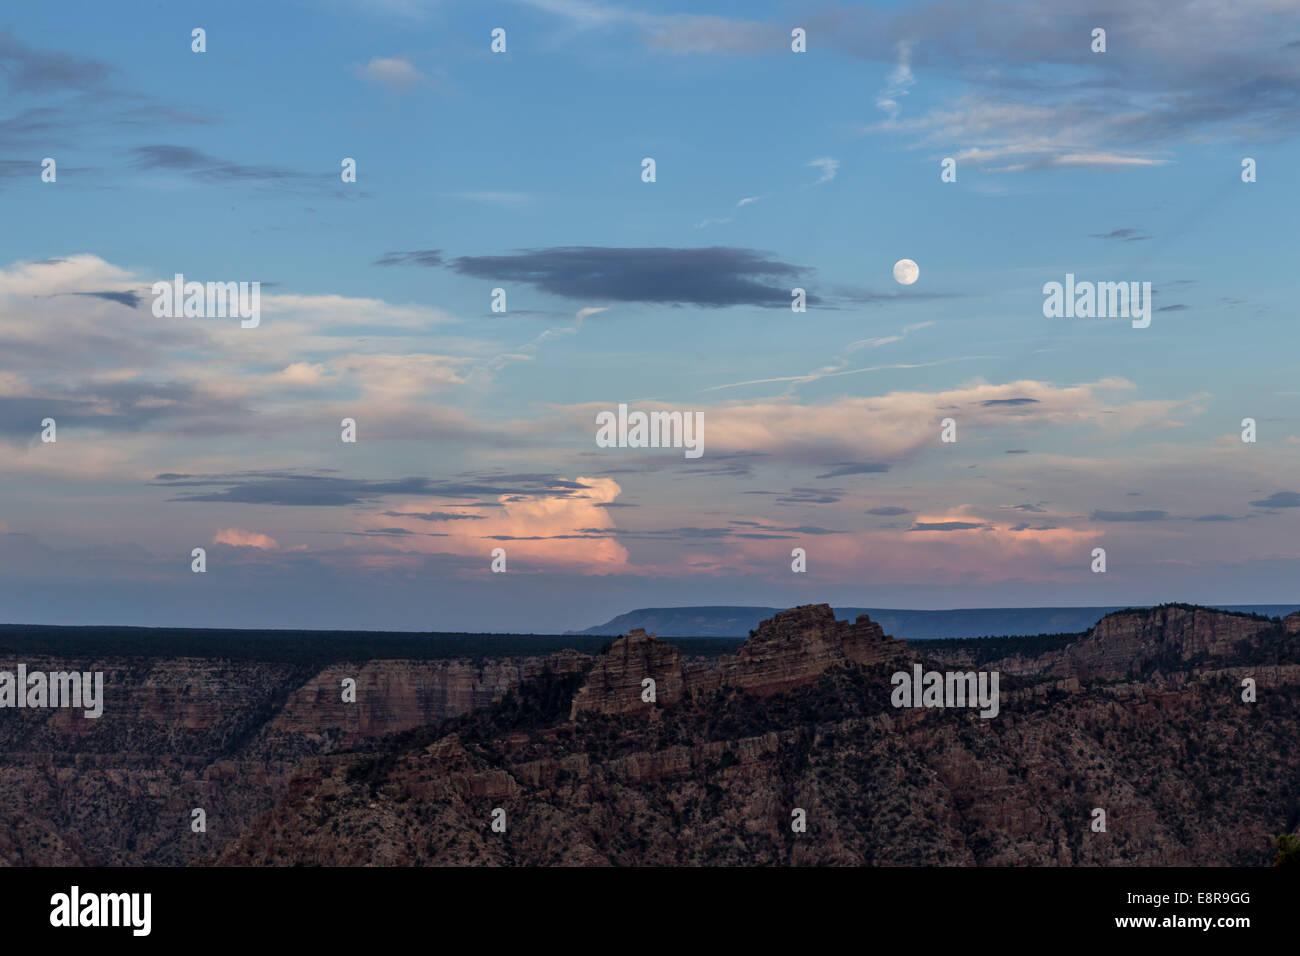 Full moon over the Grand Canyon. USA, California Stock Photo